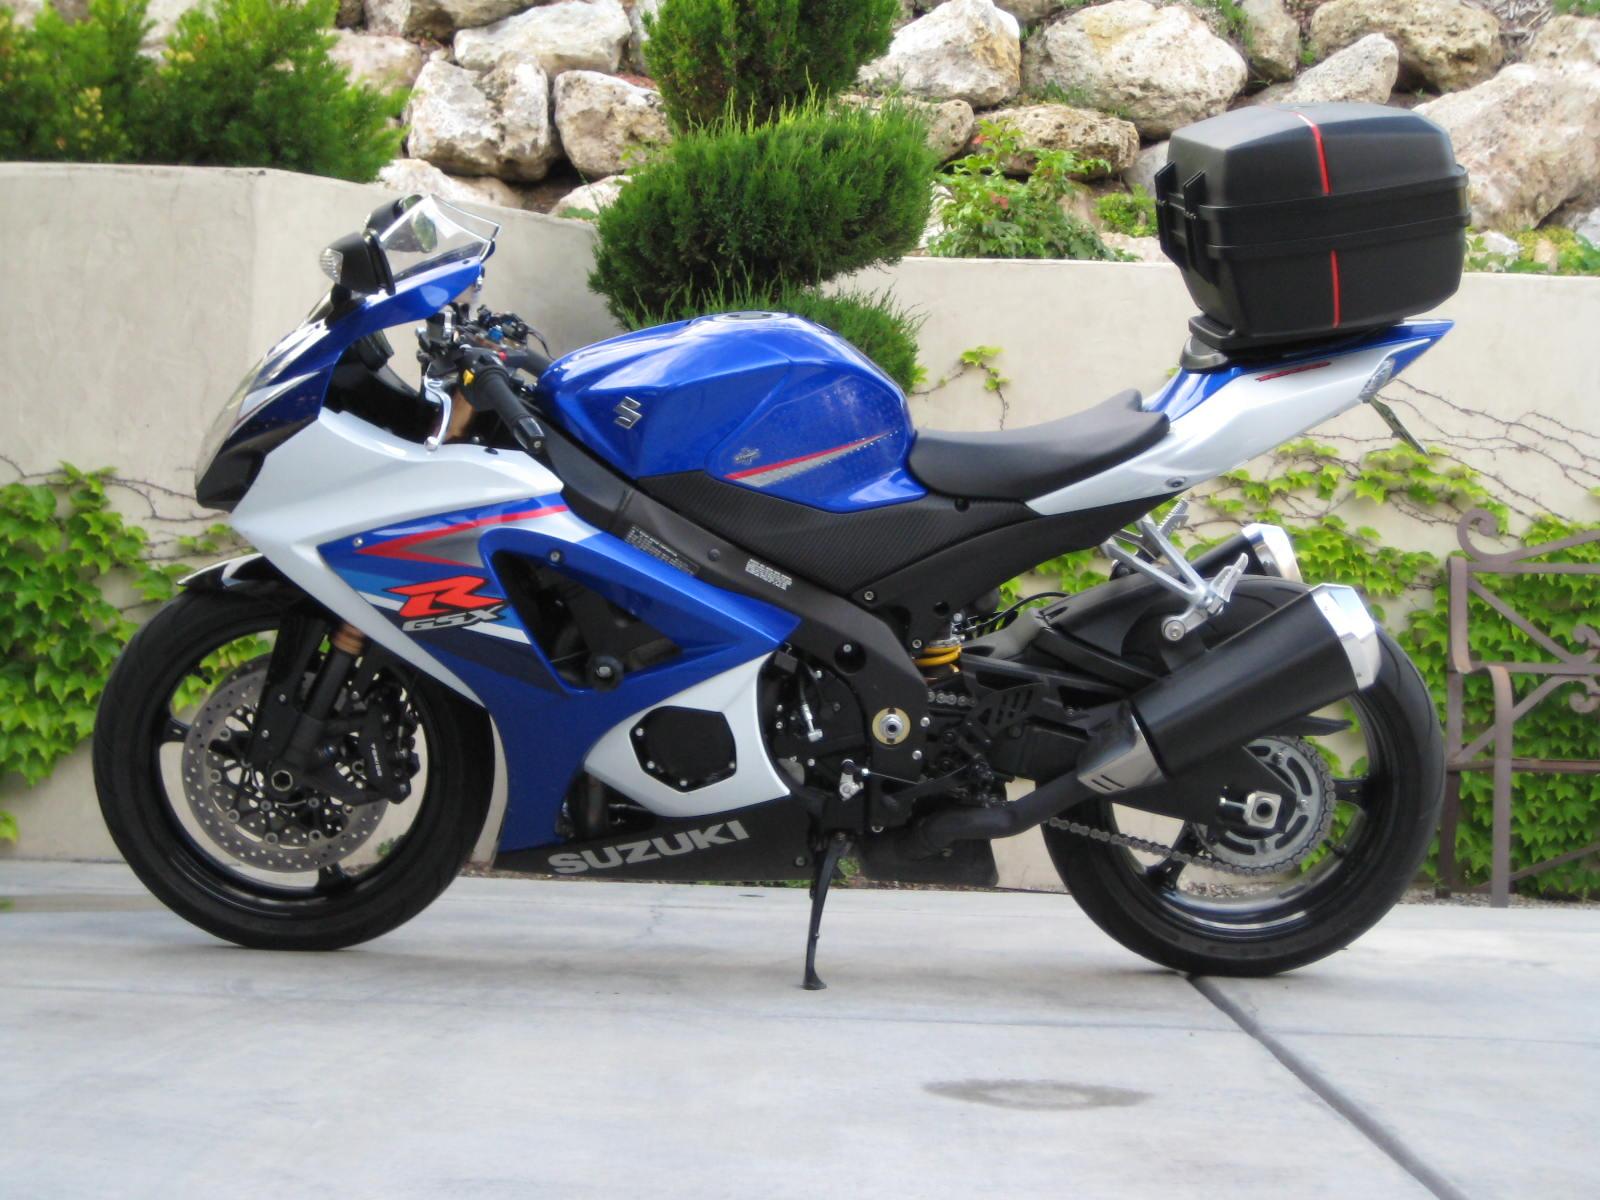 Tralhas e afins, como transportar tudo na moto? 190167d1244546666-givi-top-case-passenger-seat-img_1095